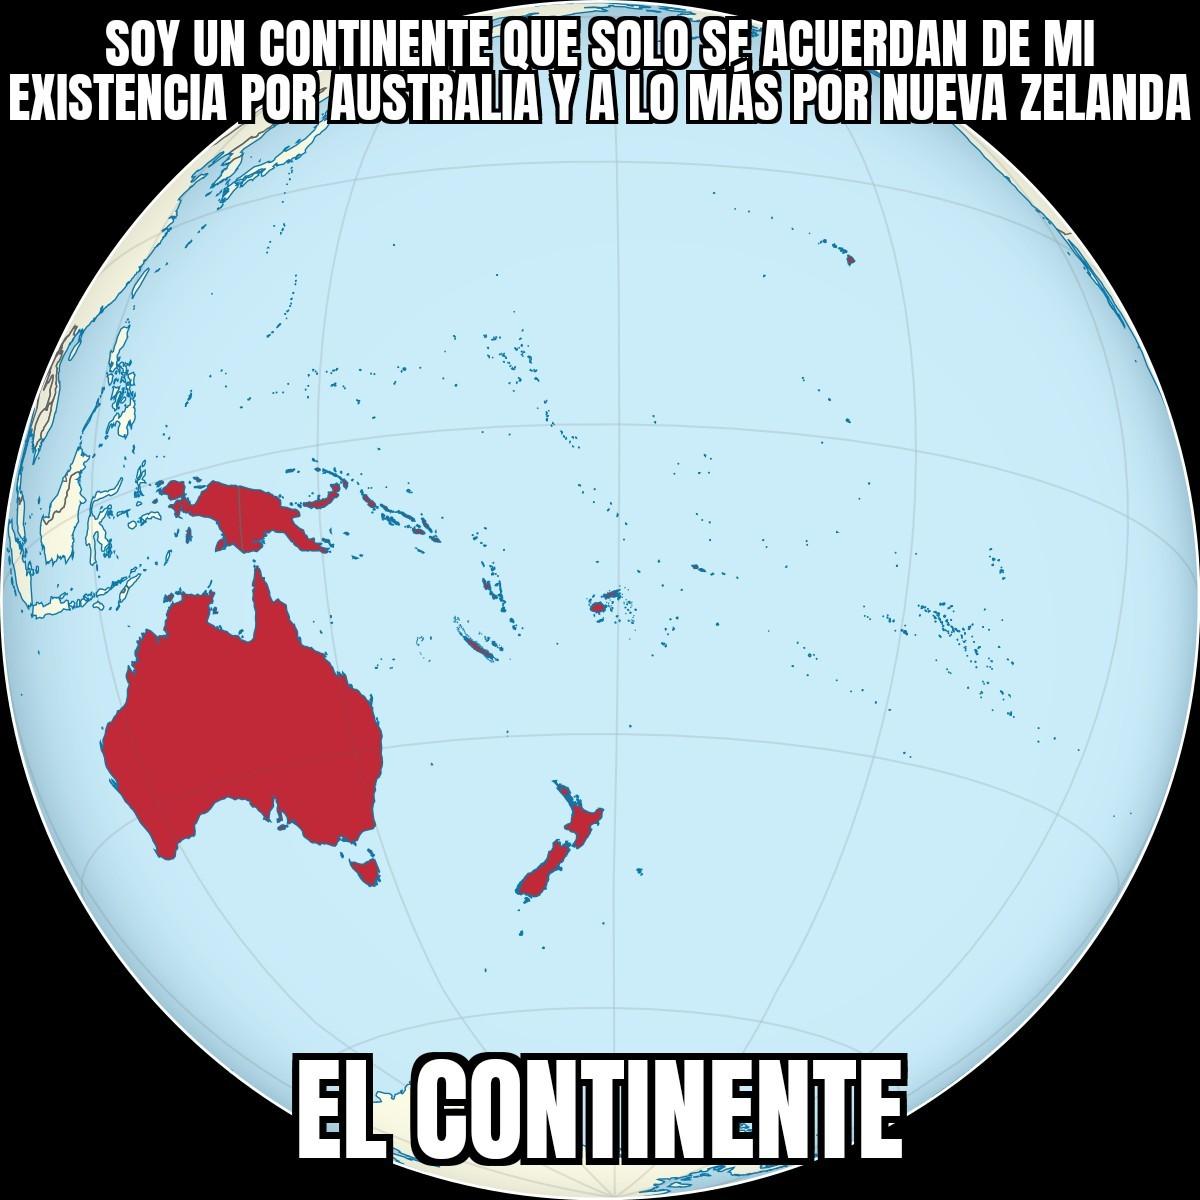 Fuera de broma solo conocen al continente por Australia - meme